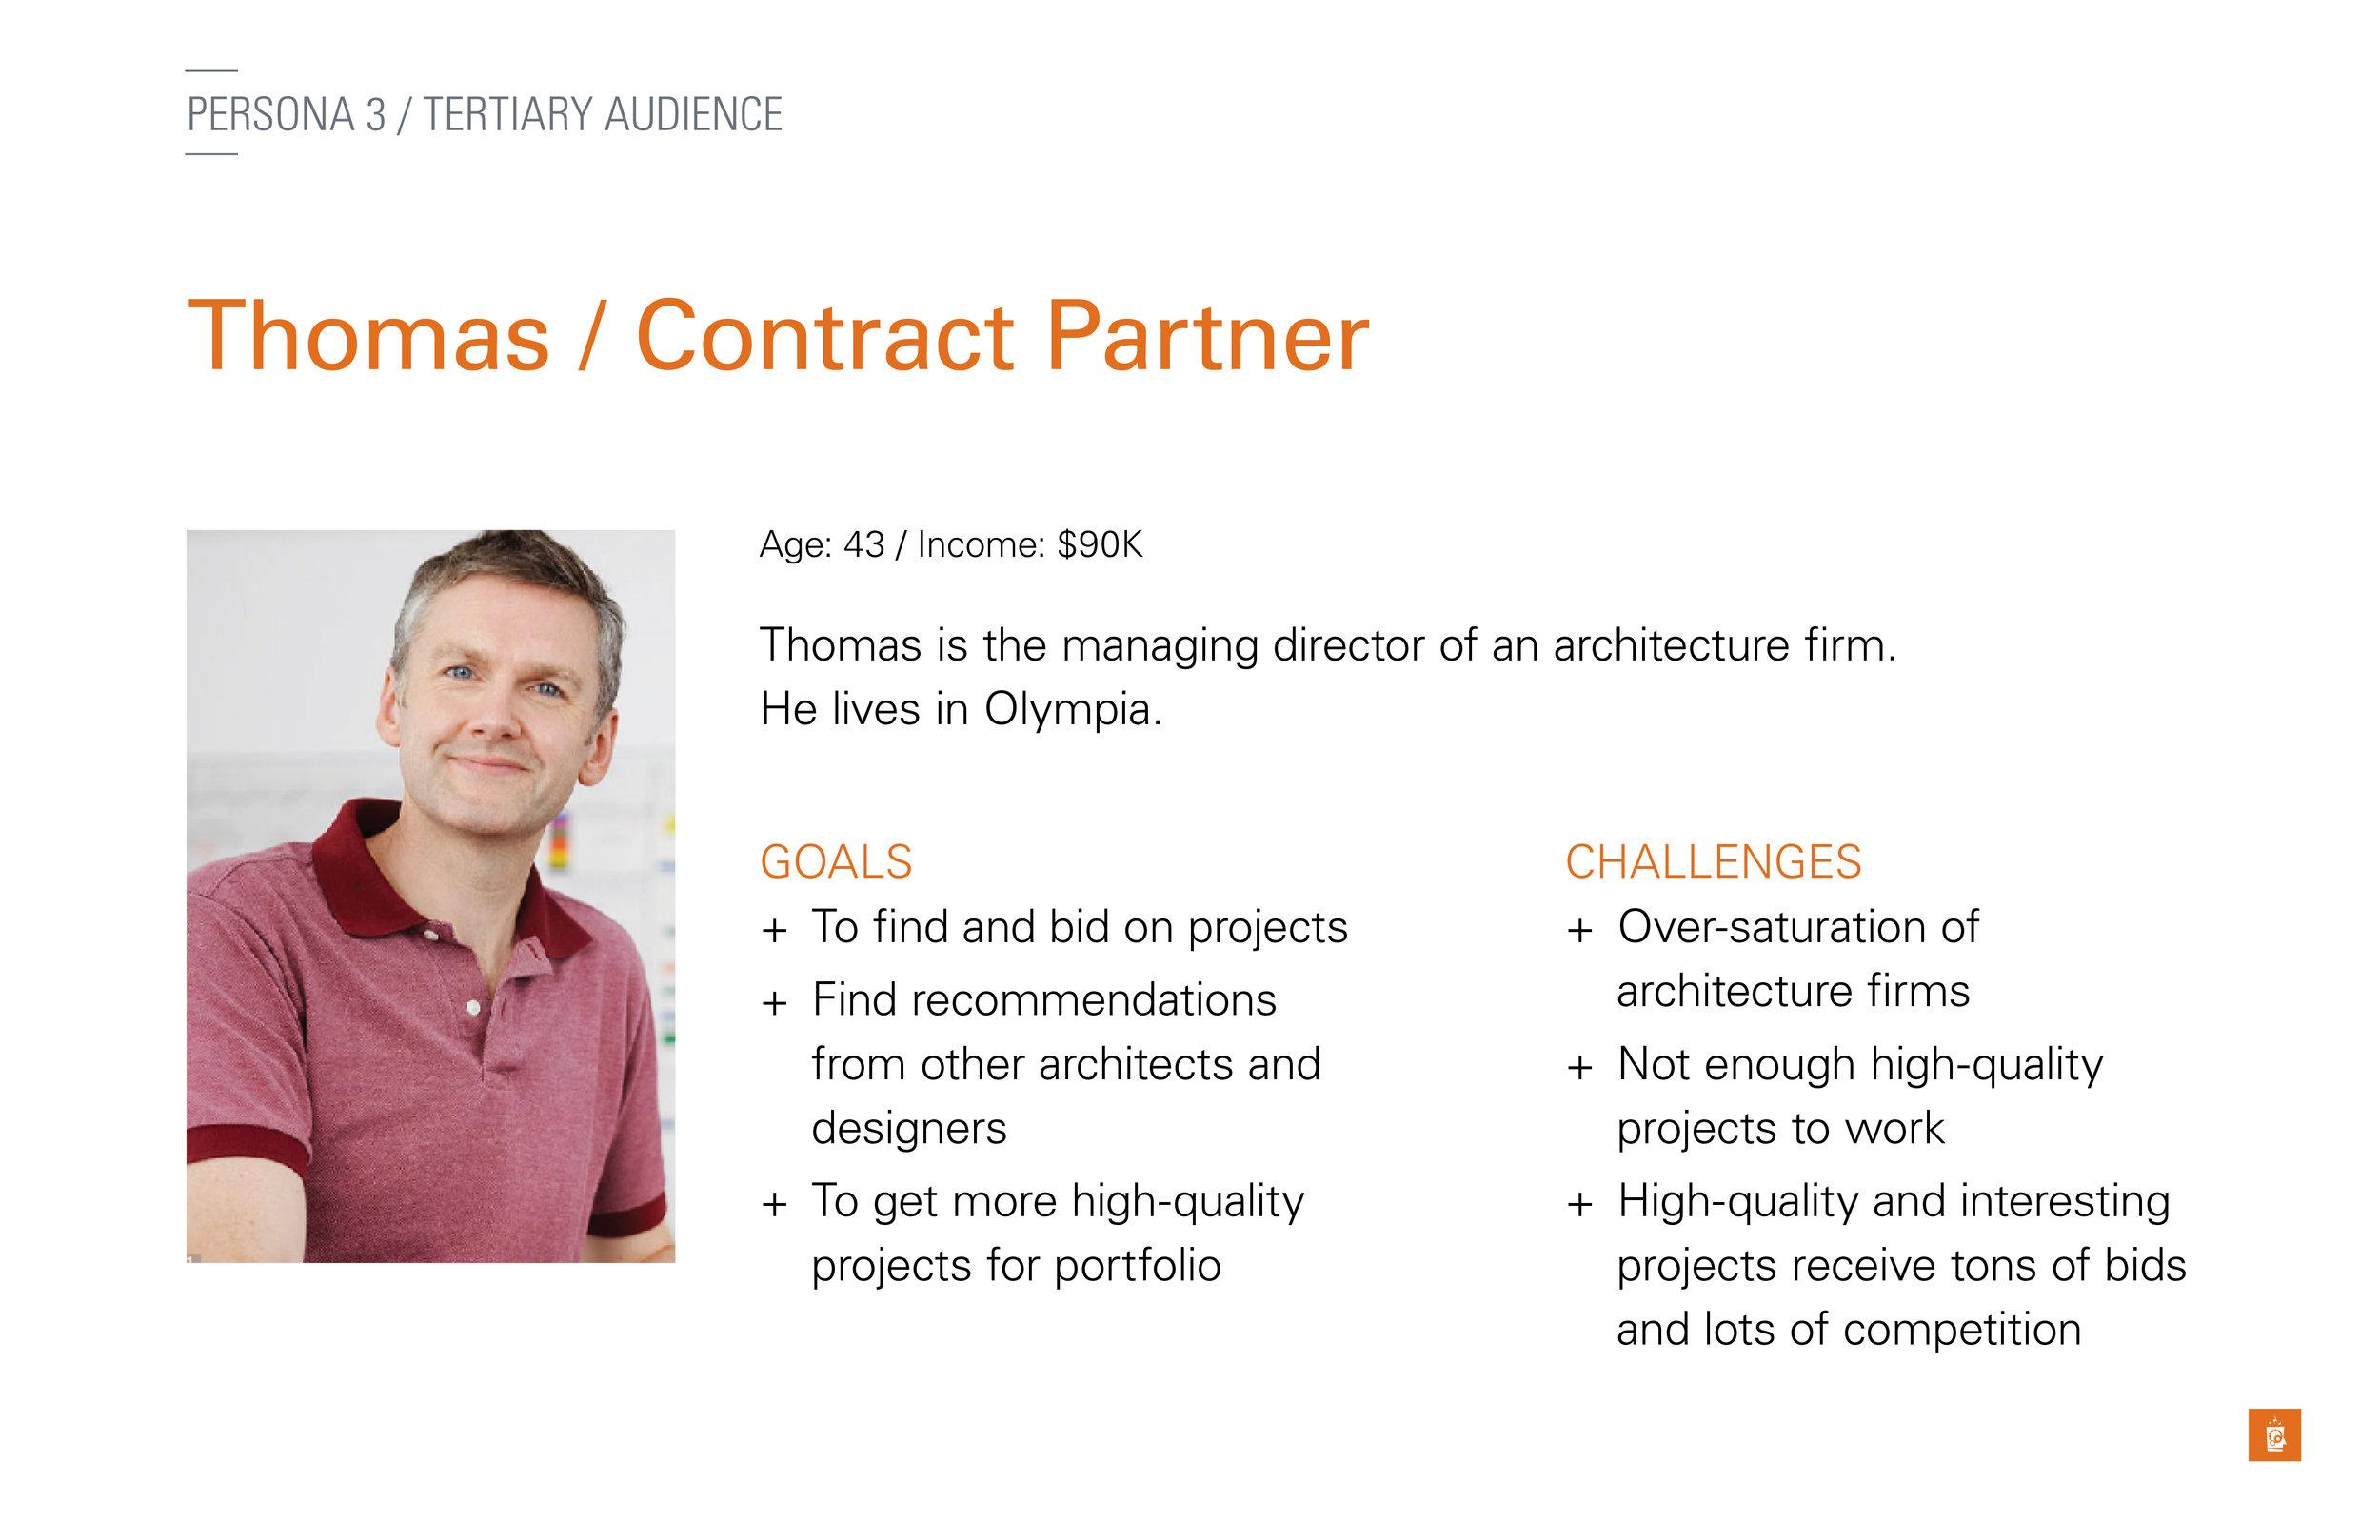 Thomas, the Contract Partner persona